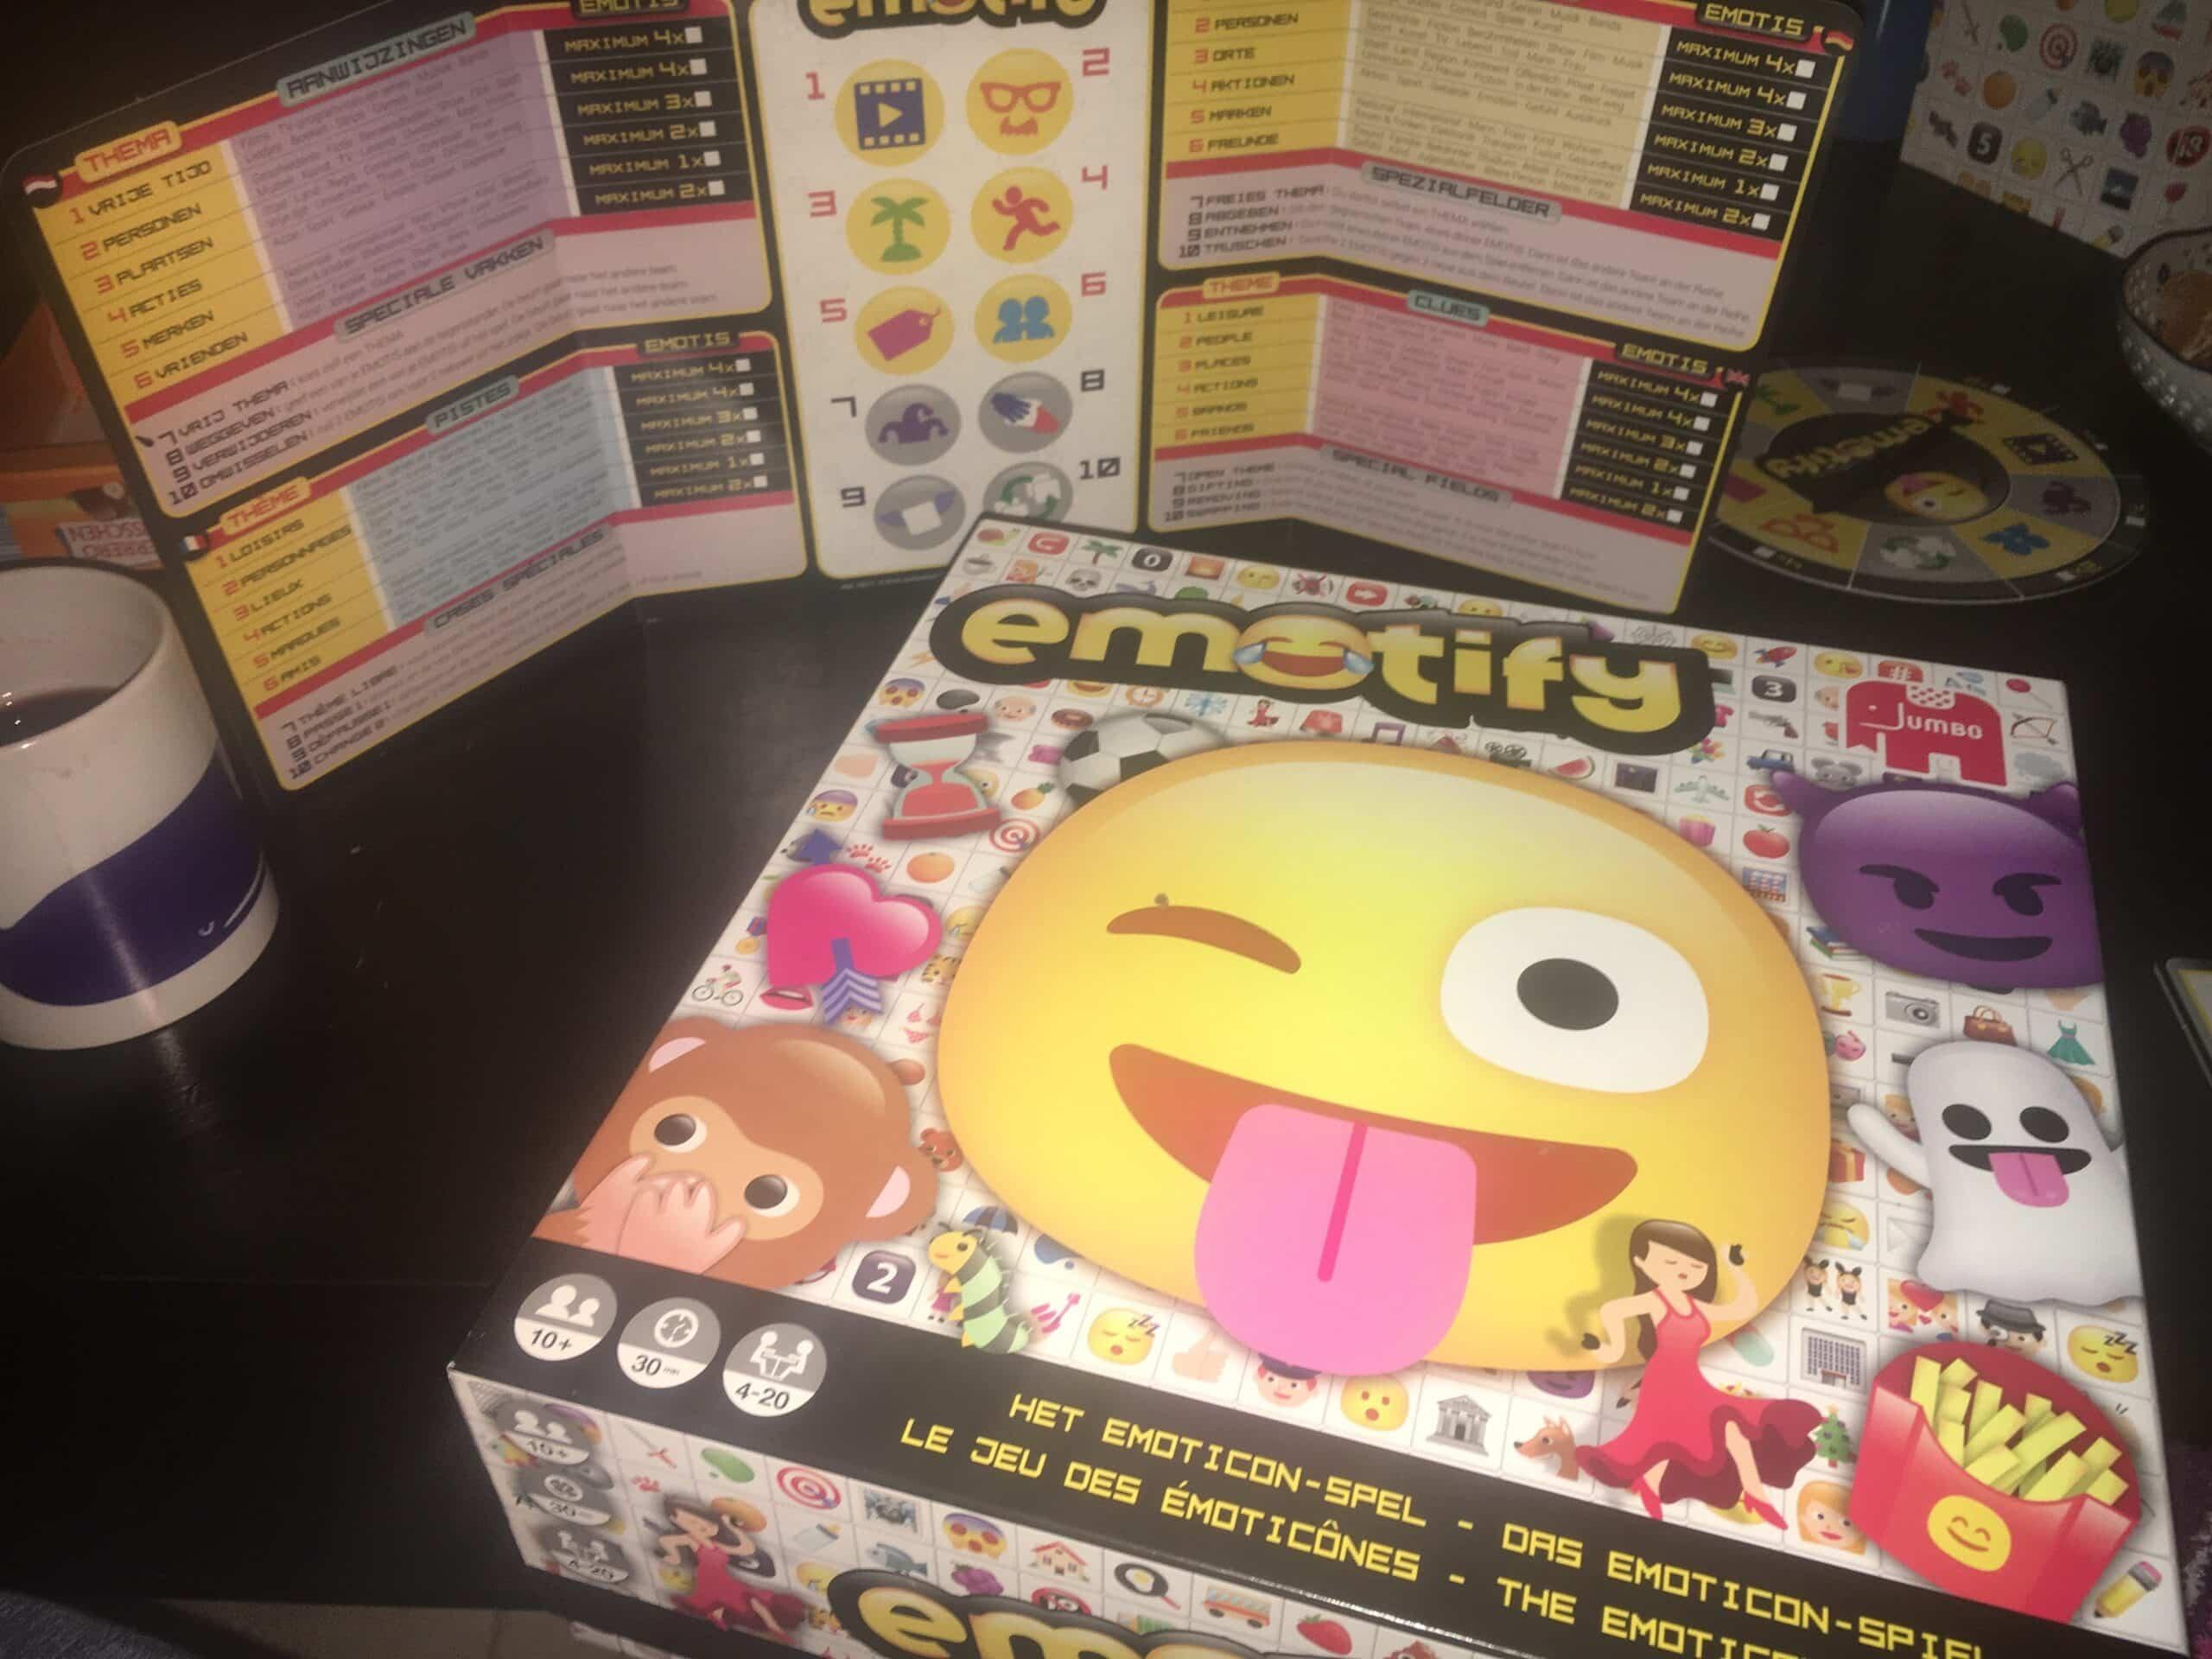 Emotify Spiel